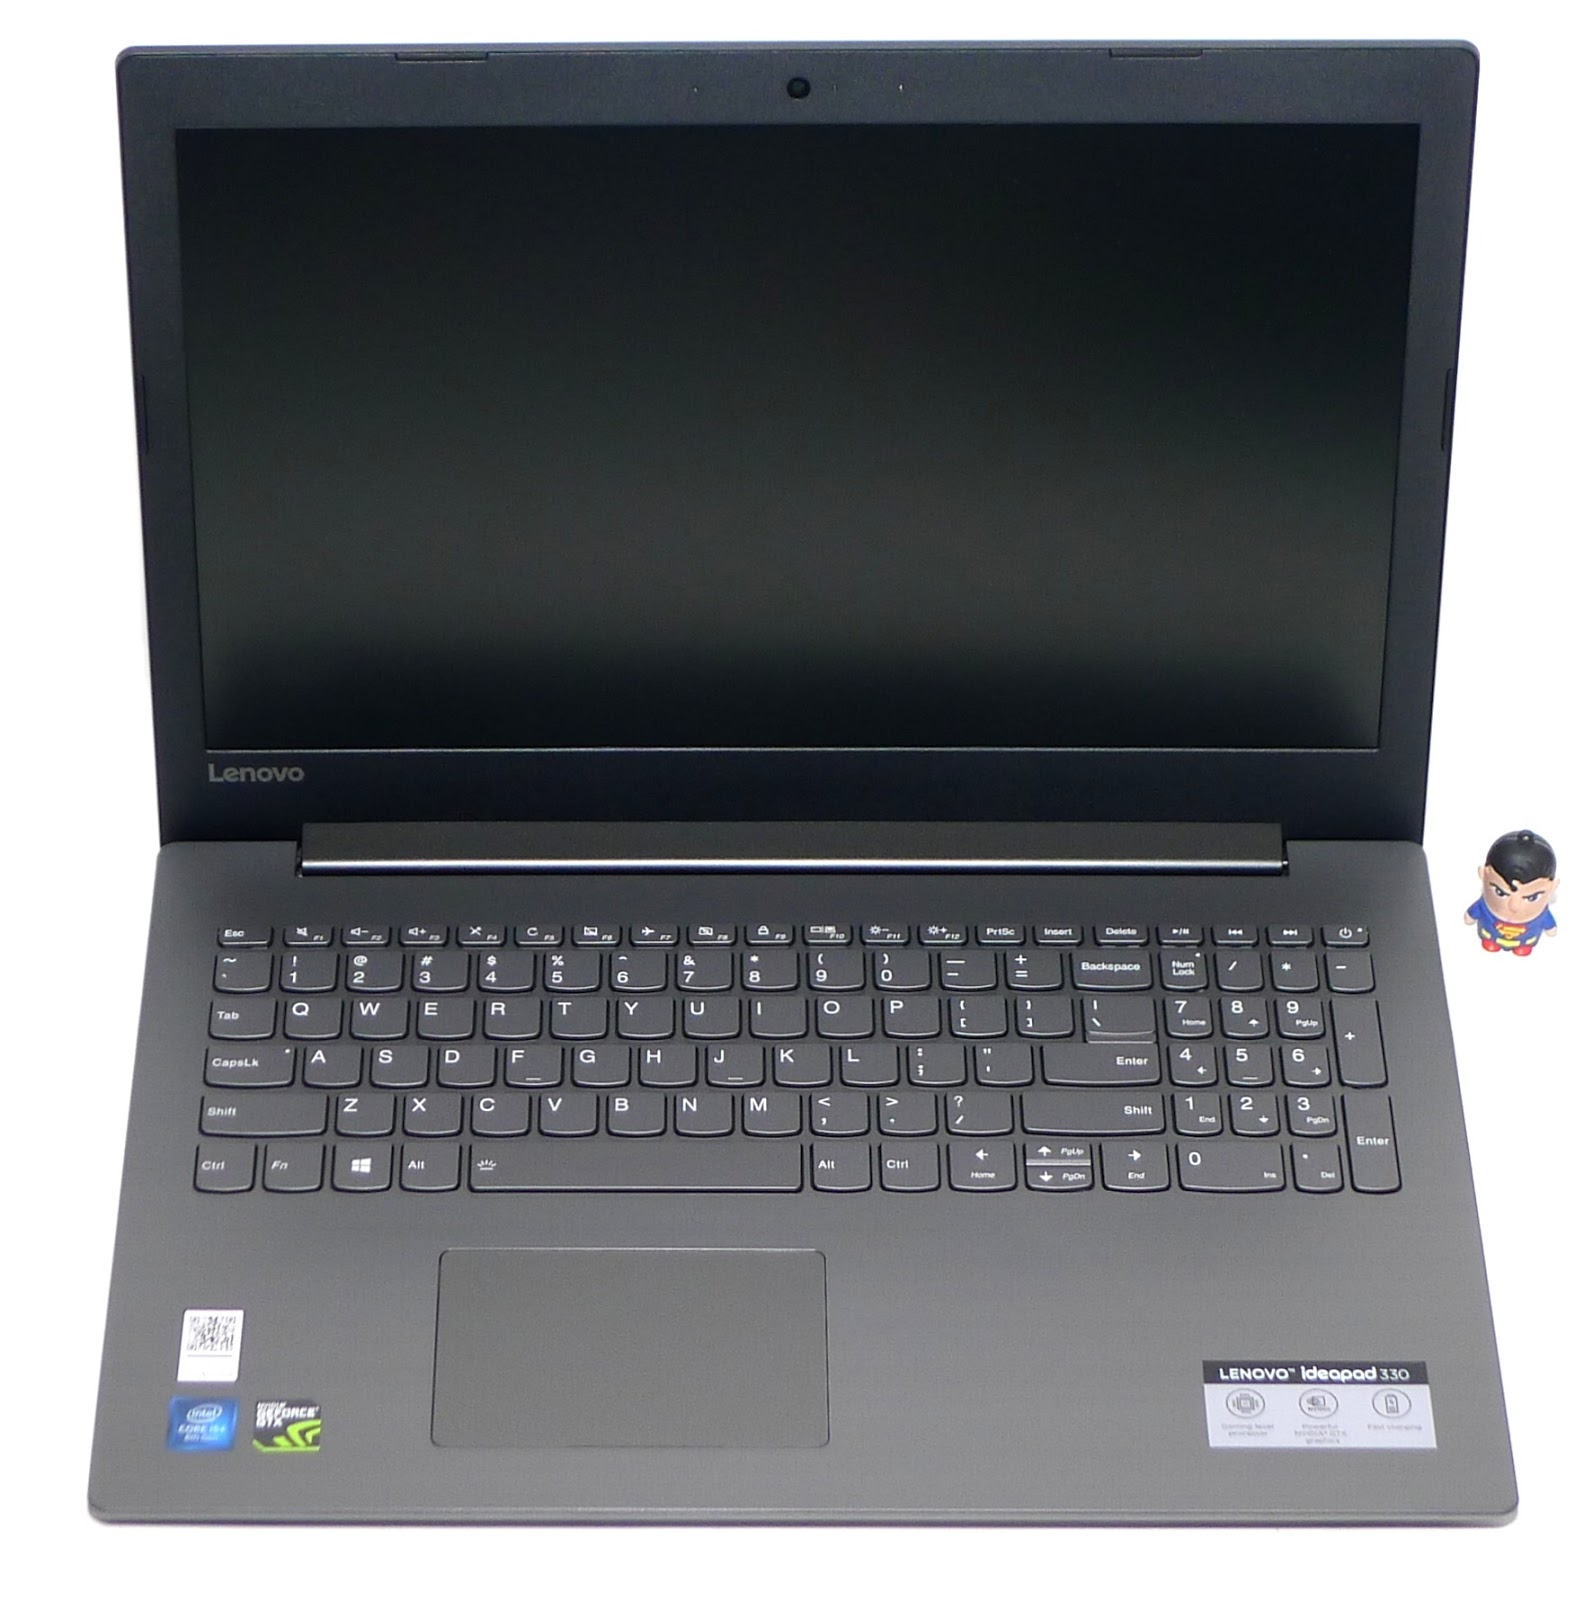 Jual Beli Laptop Bekas Kamera Service Sparepart Di Malang Lenovo Thinkpad X230 I5 8gb 128gb Ssd 12 Baru Ideapad 330 15ich Core